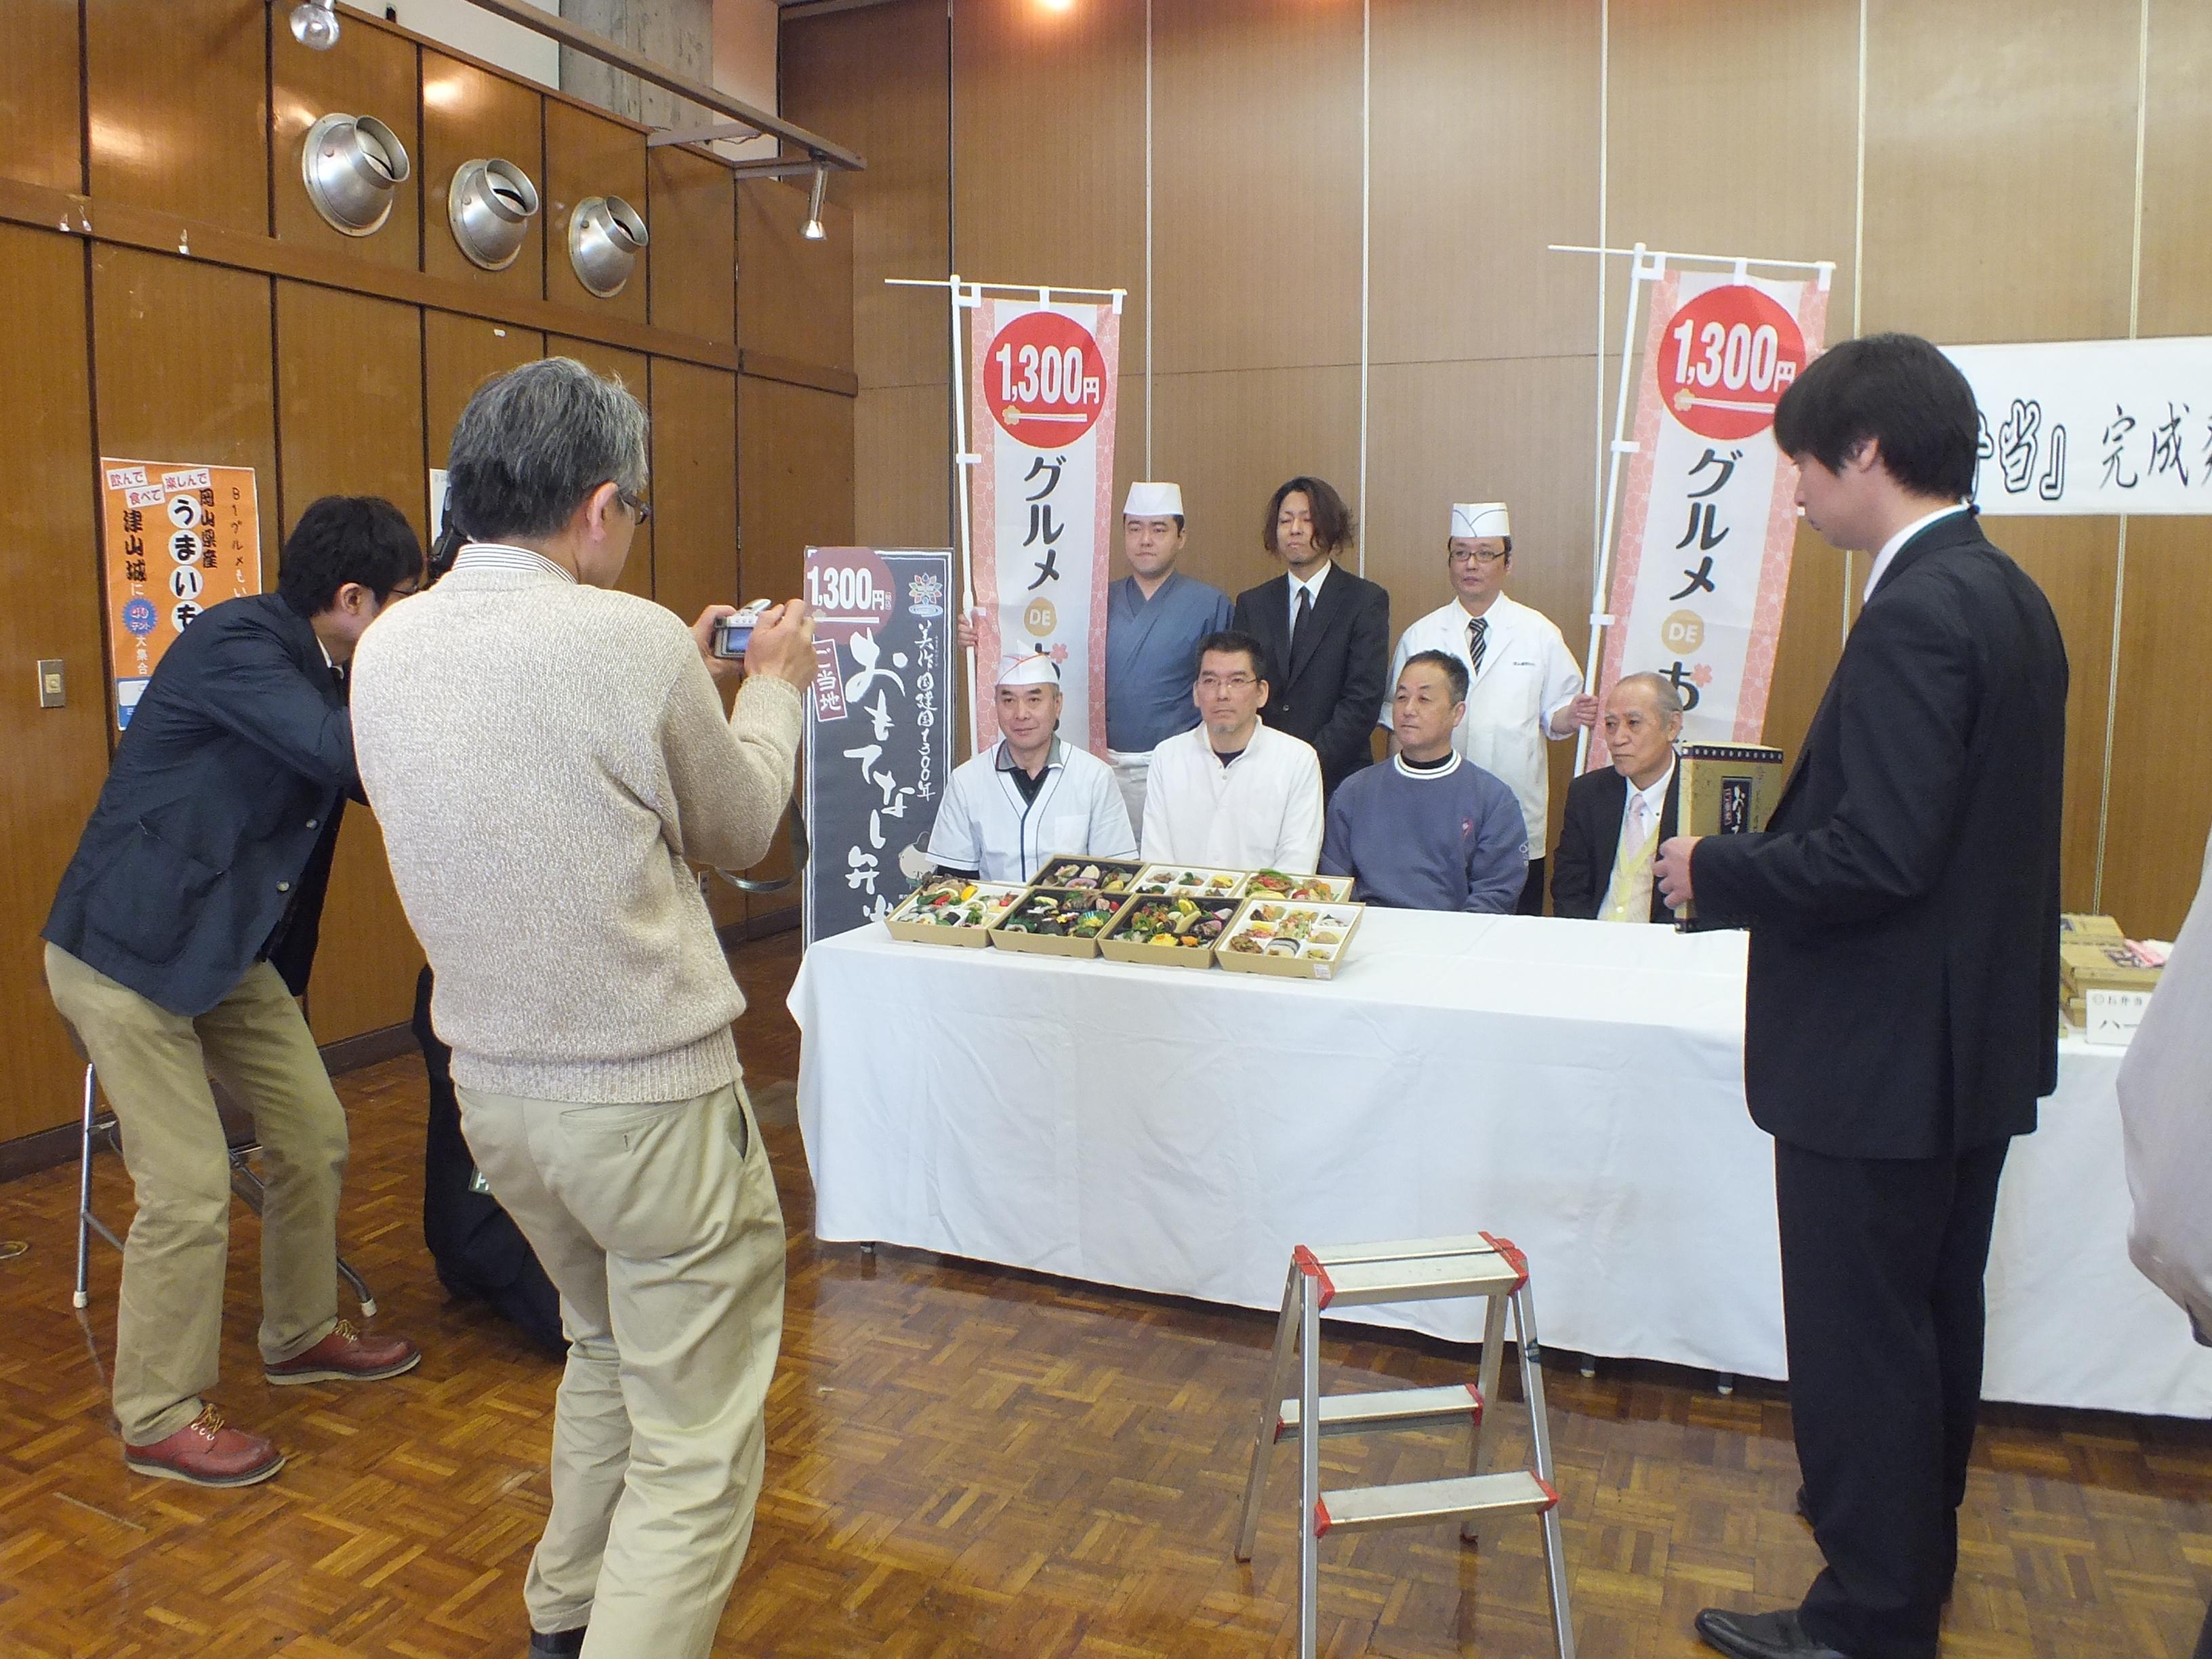 http://www.e-tsuyama.com/report/assets/2013/04/01/DSCF6052.JPG